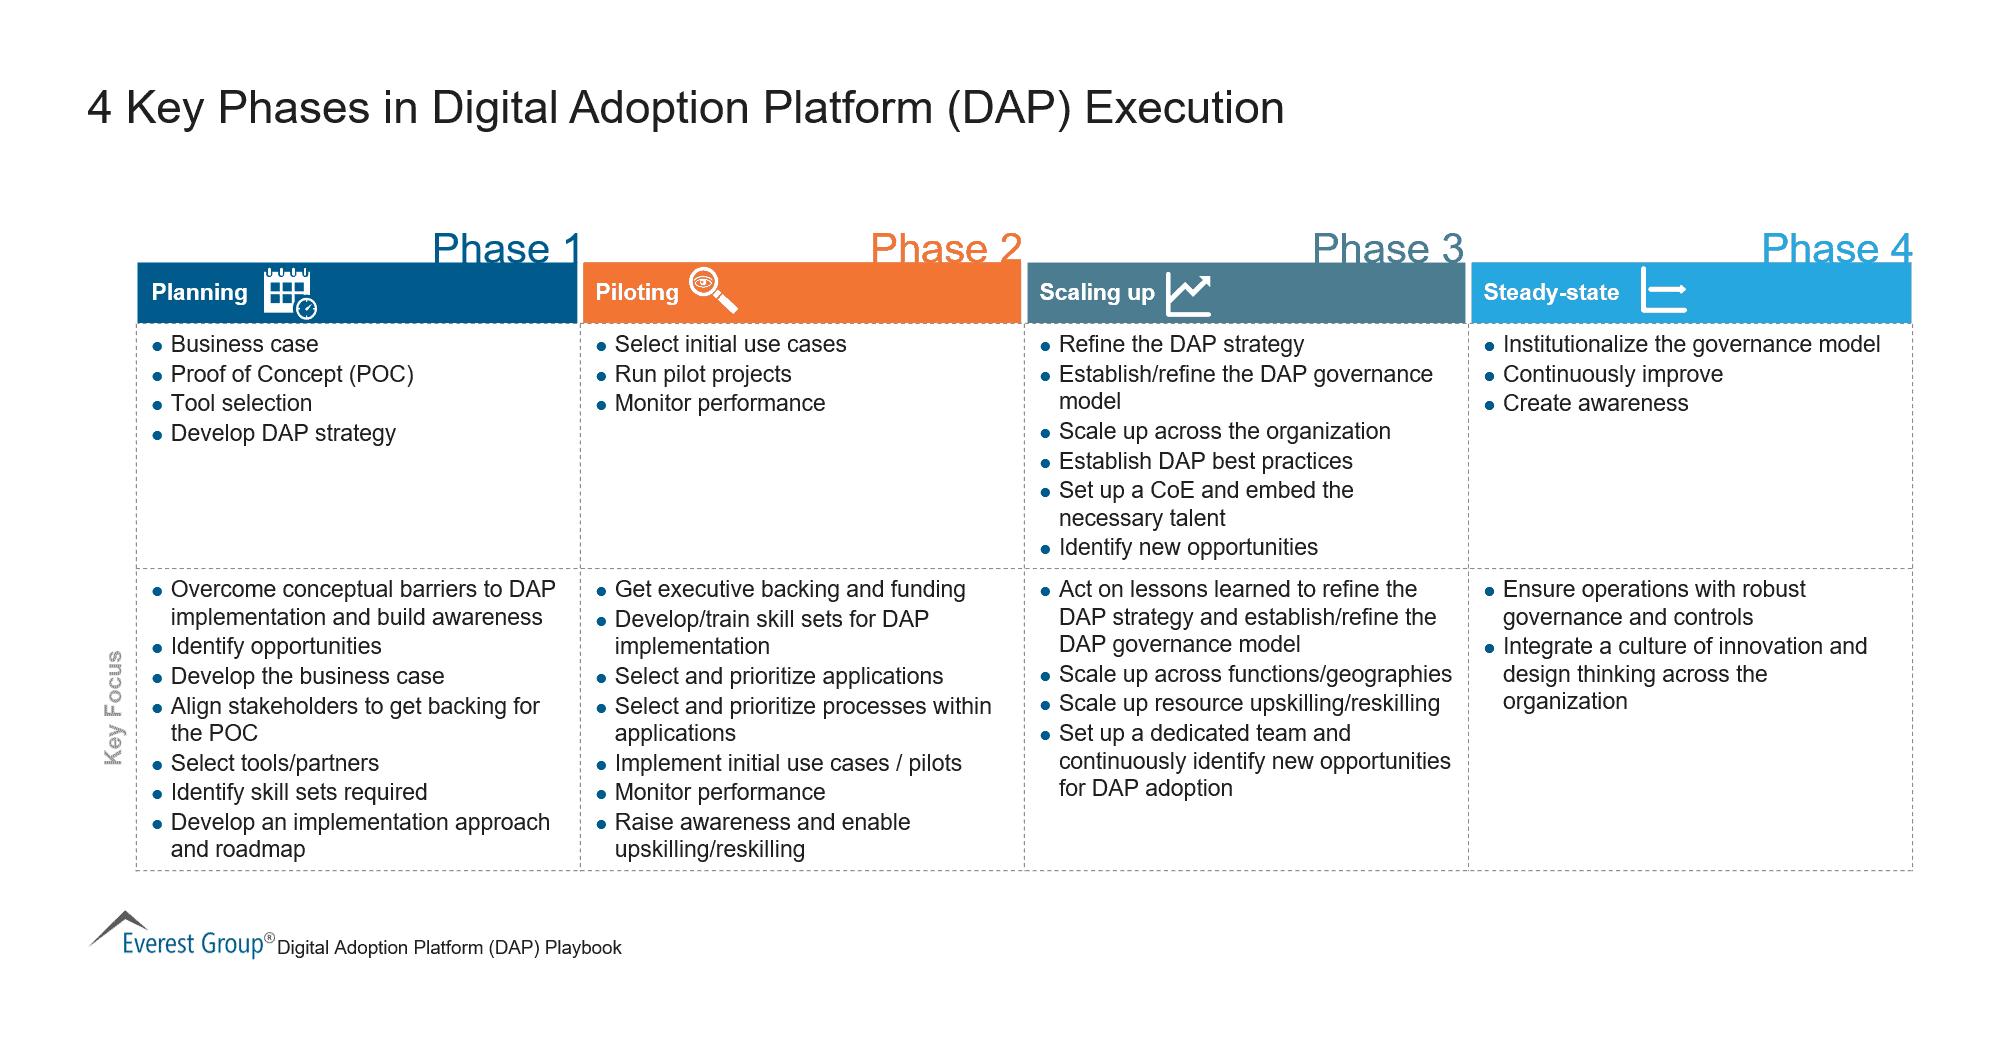 4 Key Phases in Digital Adoption Platform Execution